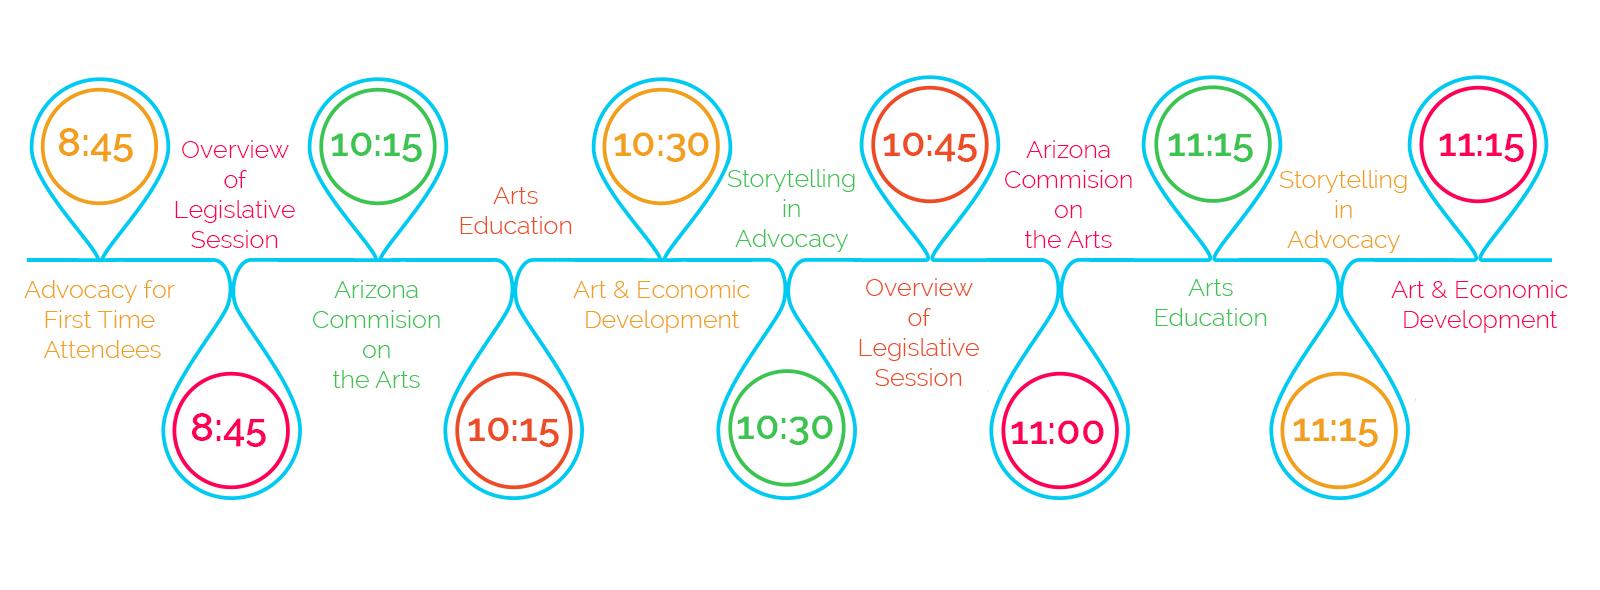 AC Workshop Timeline » Arizona Citizens for the Arts